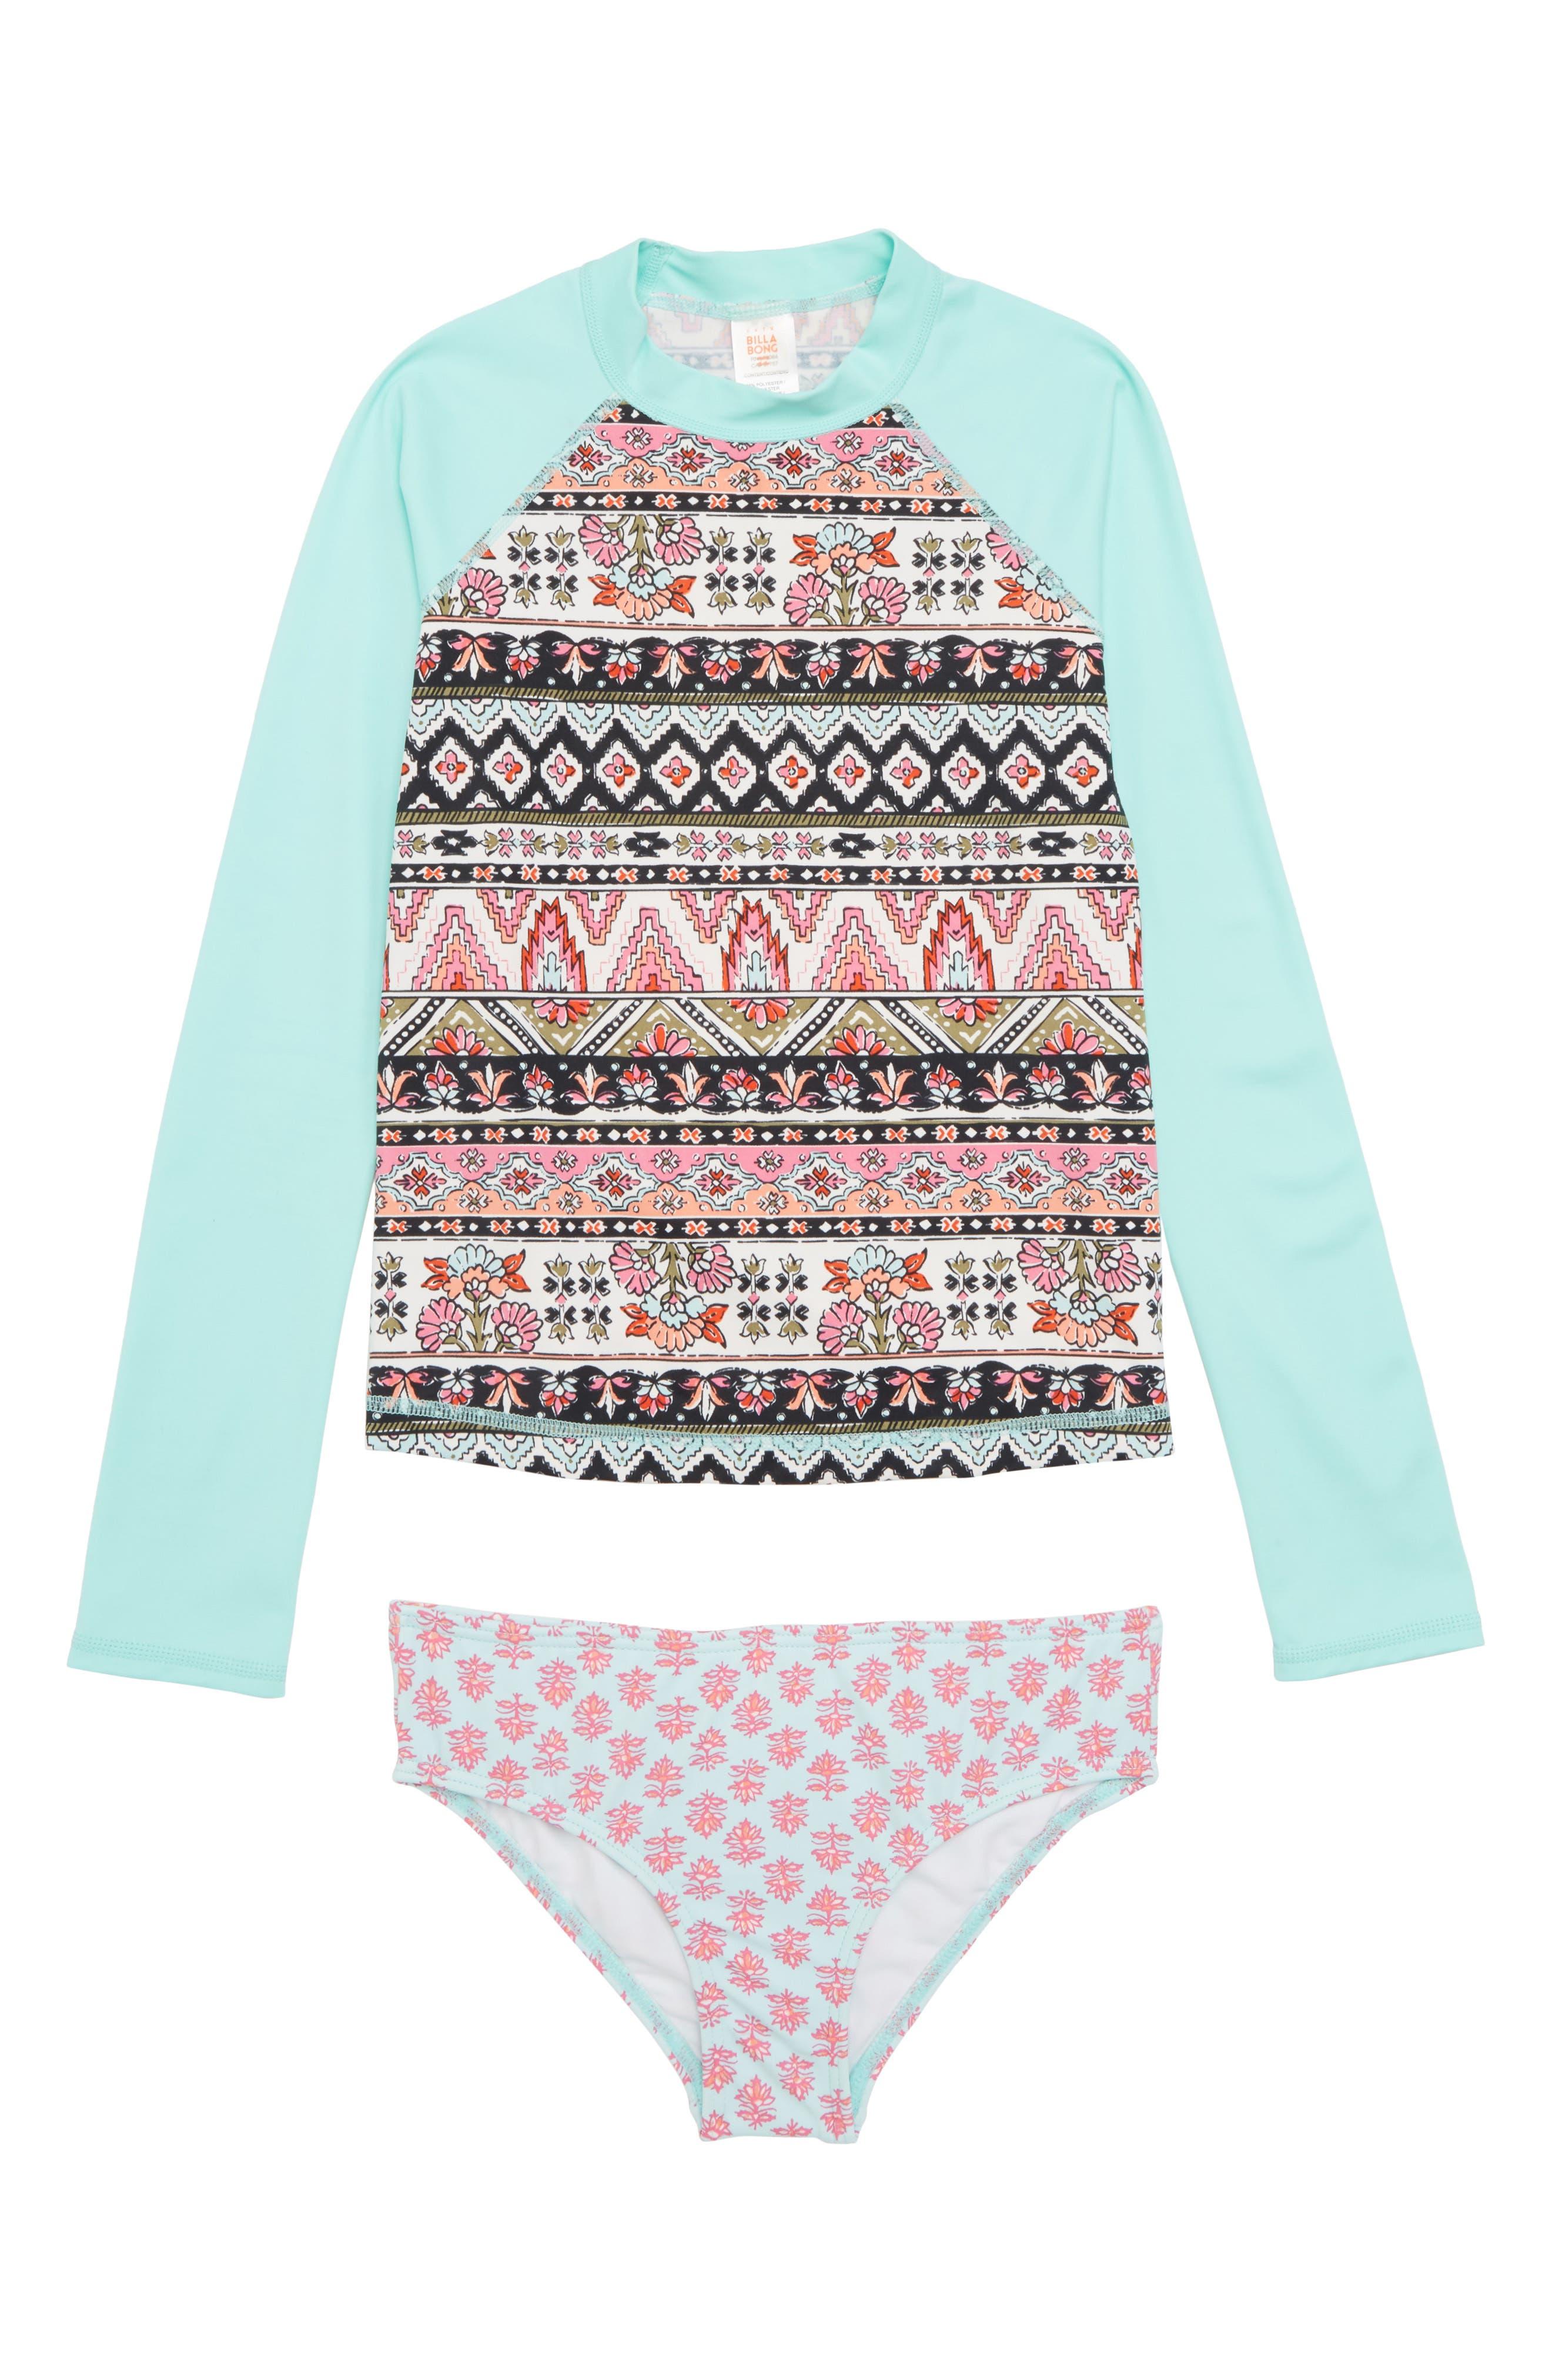 Moon Tribe Two-Piece Rashguard Swimsuit,                         Main,                         color, Multi